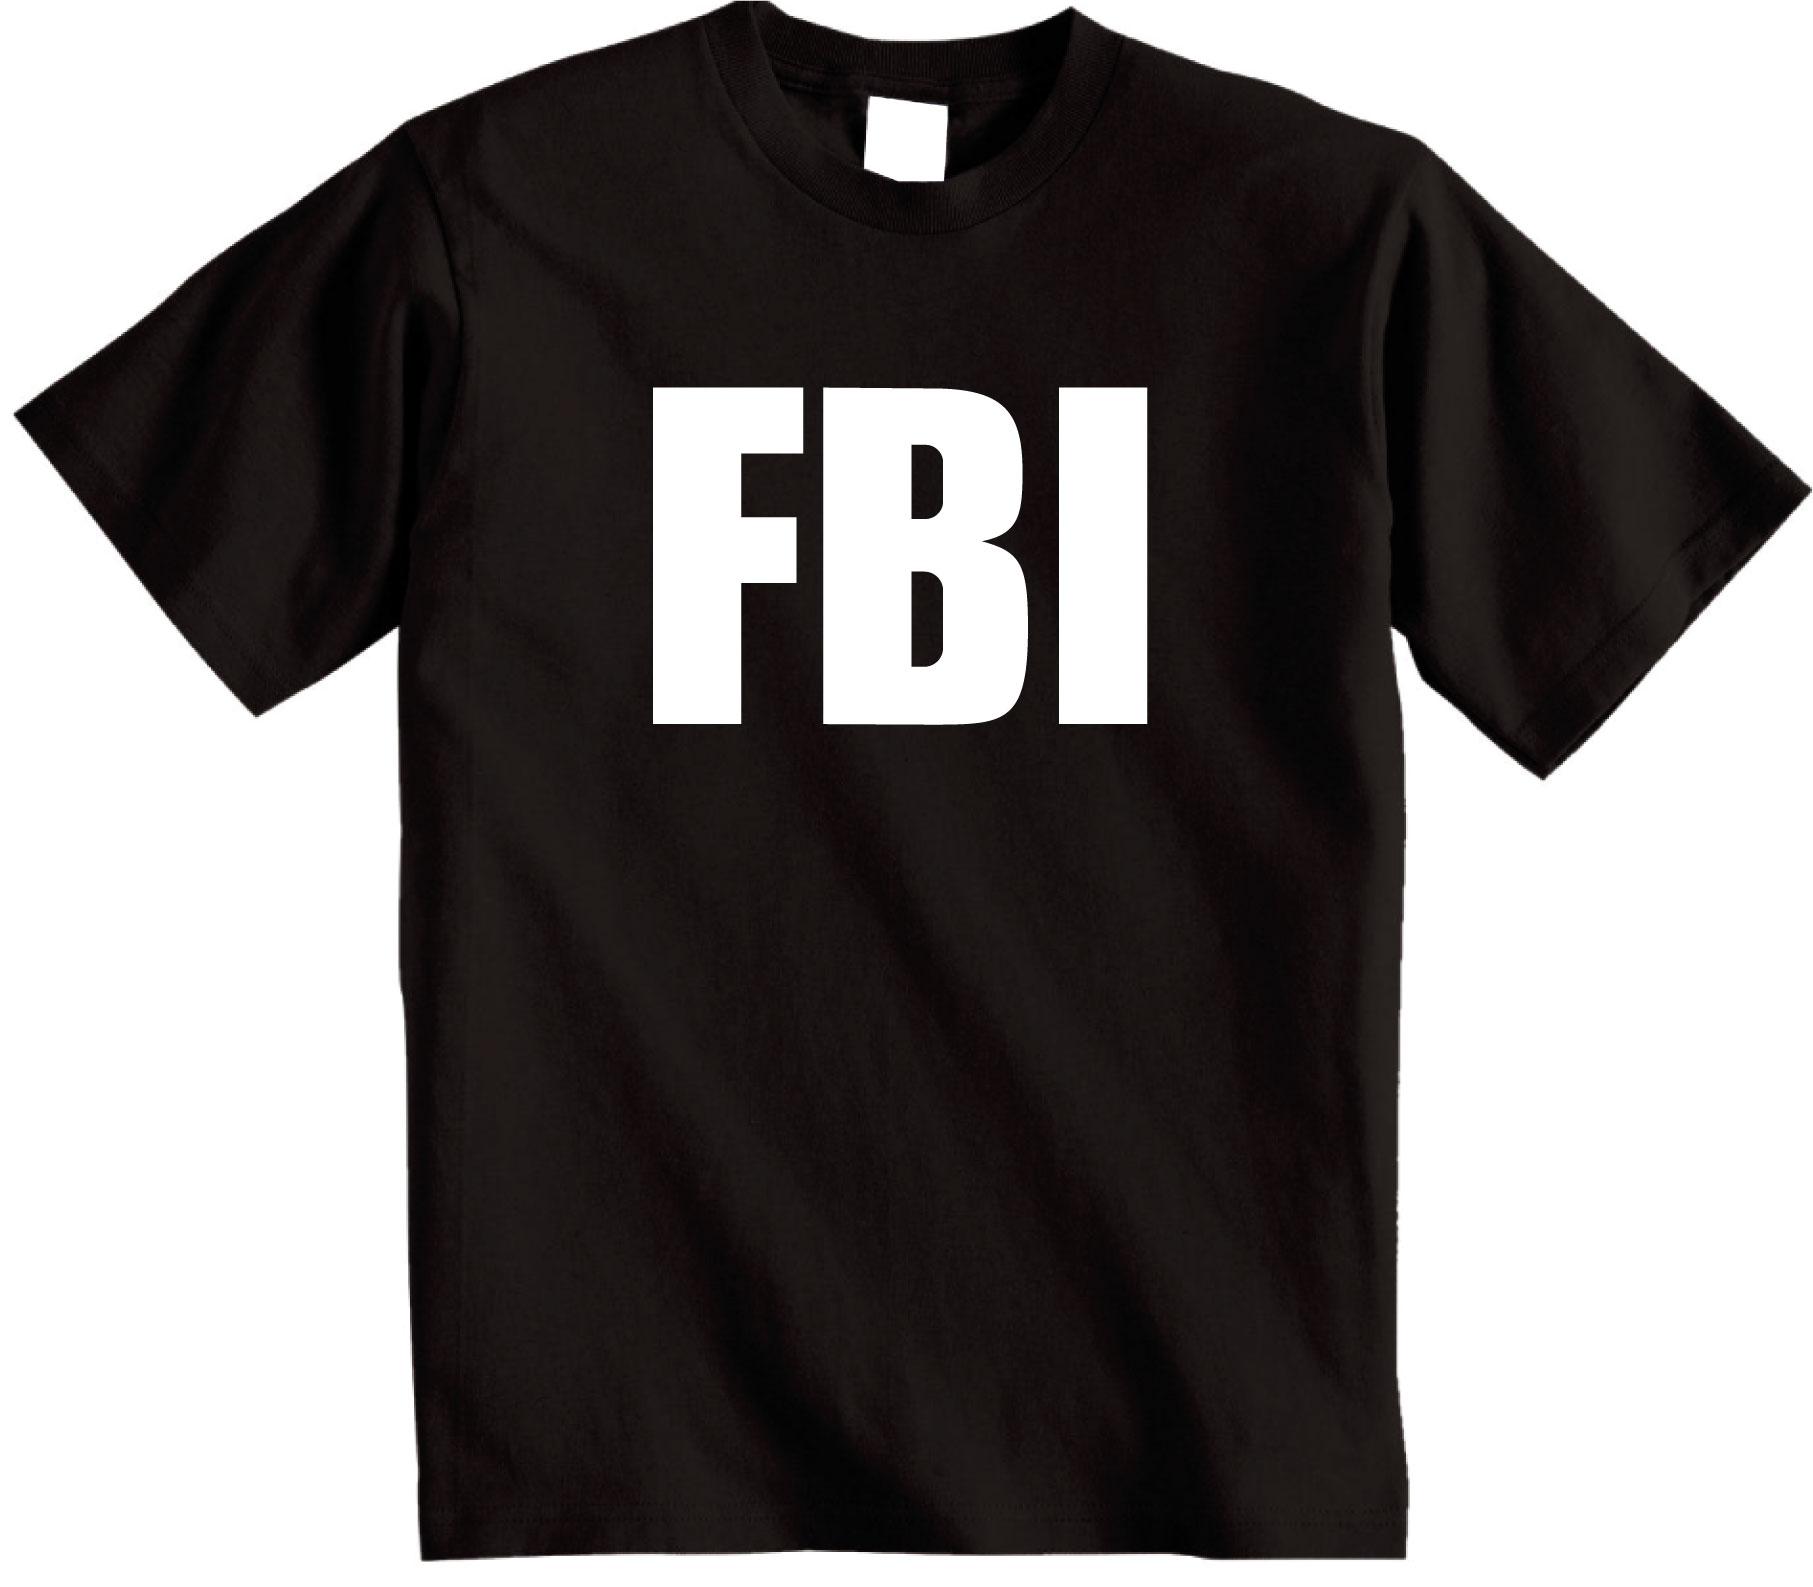 FBI t shirt Fancy dress police top Shoebob